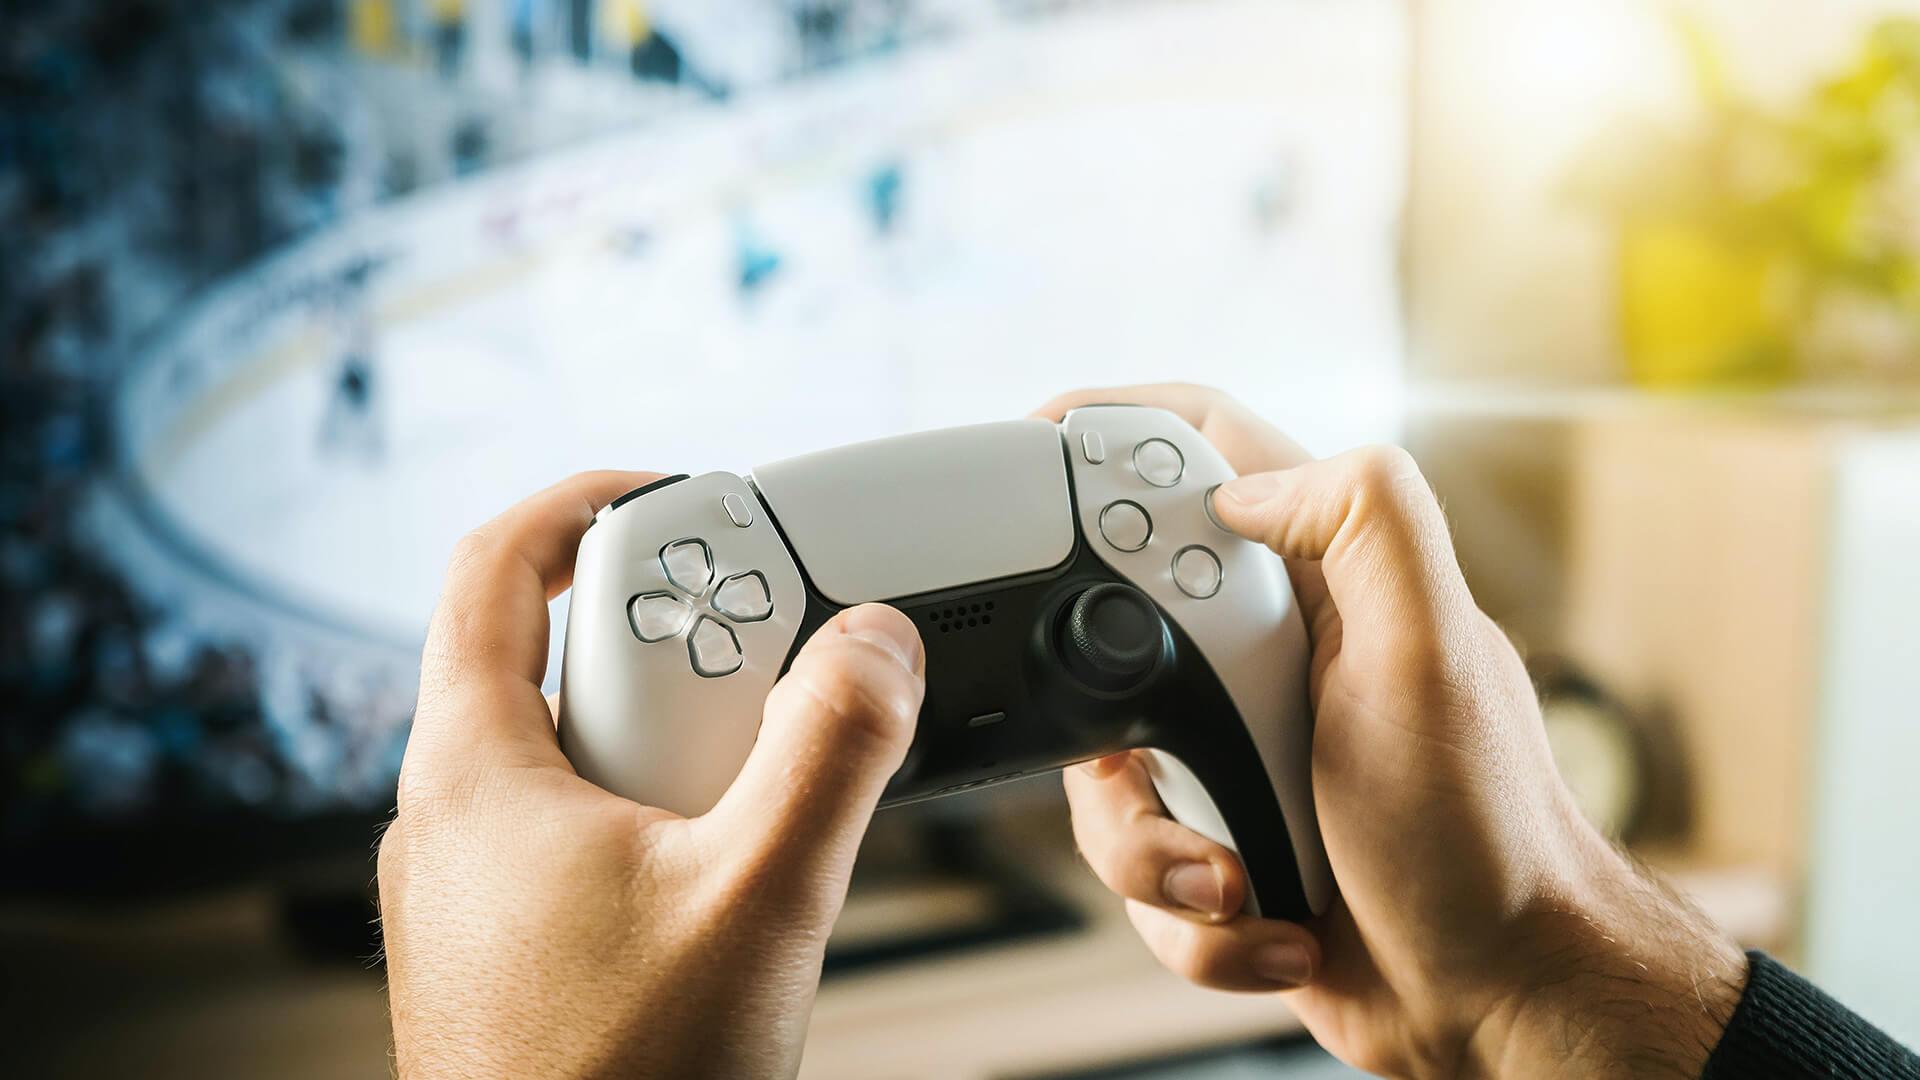 Gamer-holding-a-controller